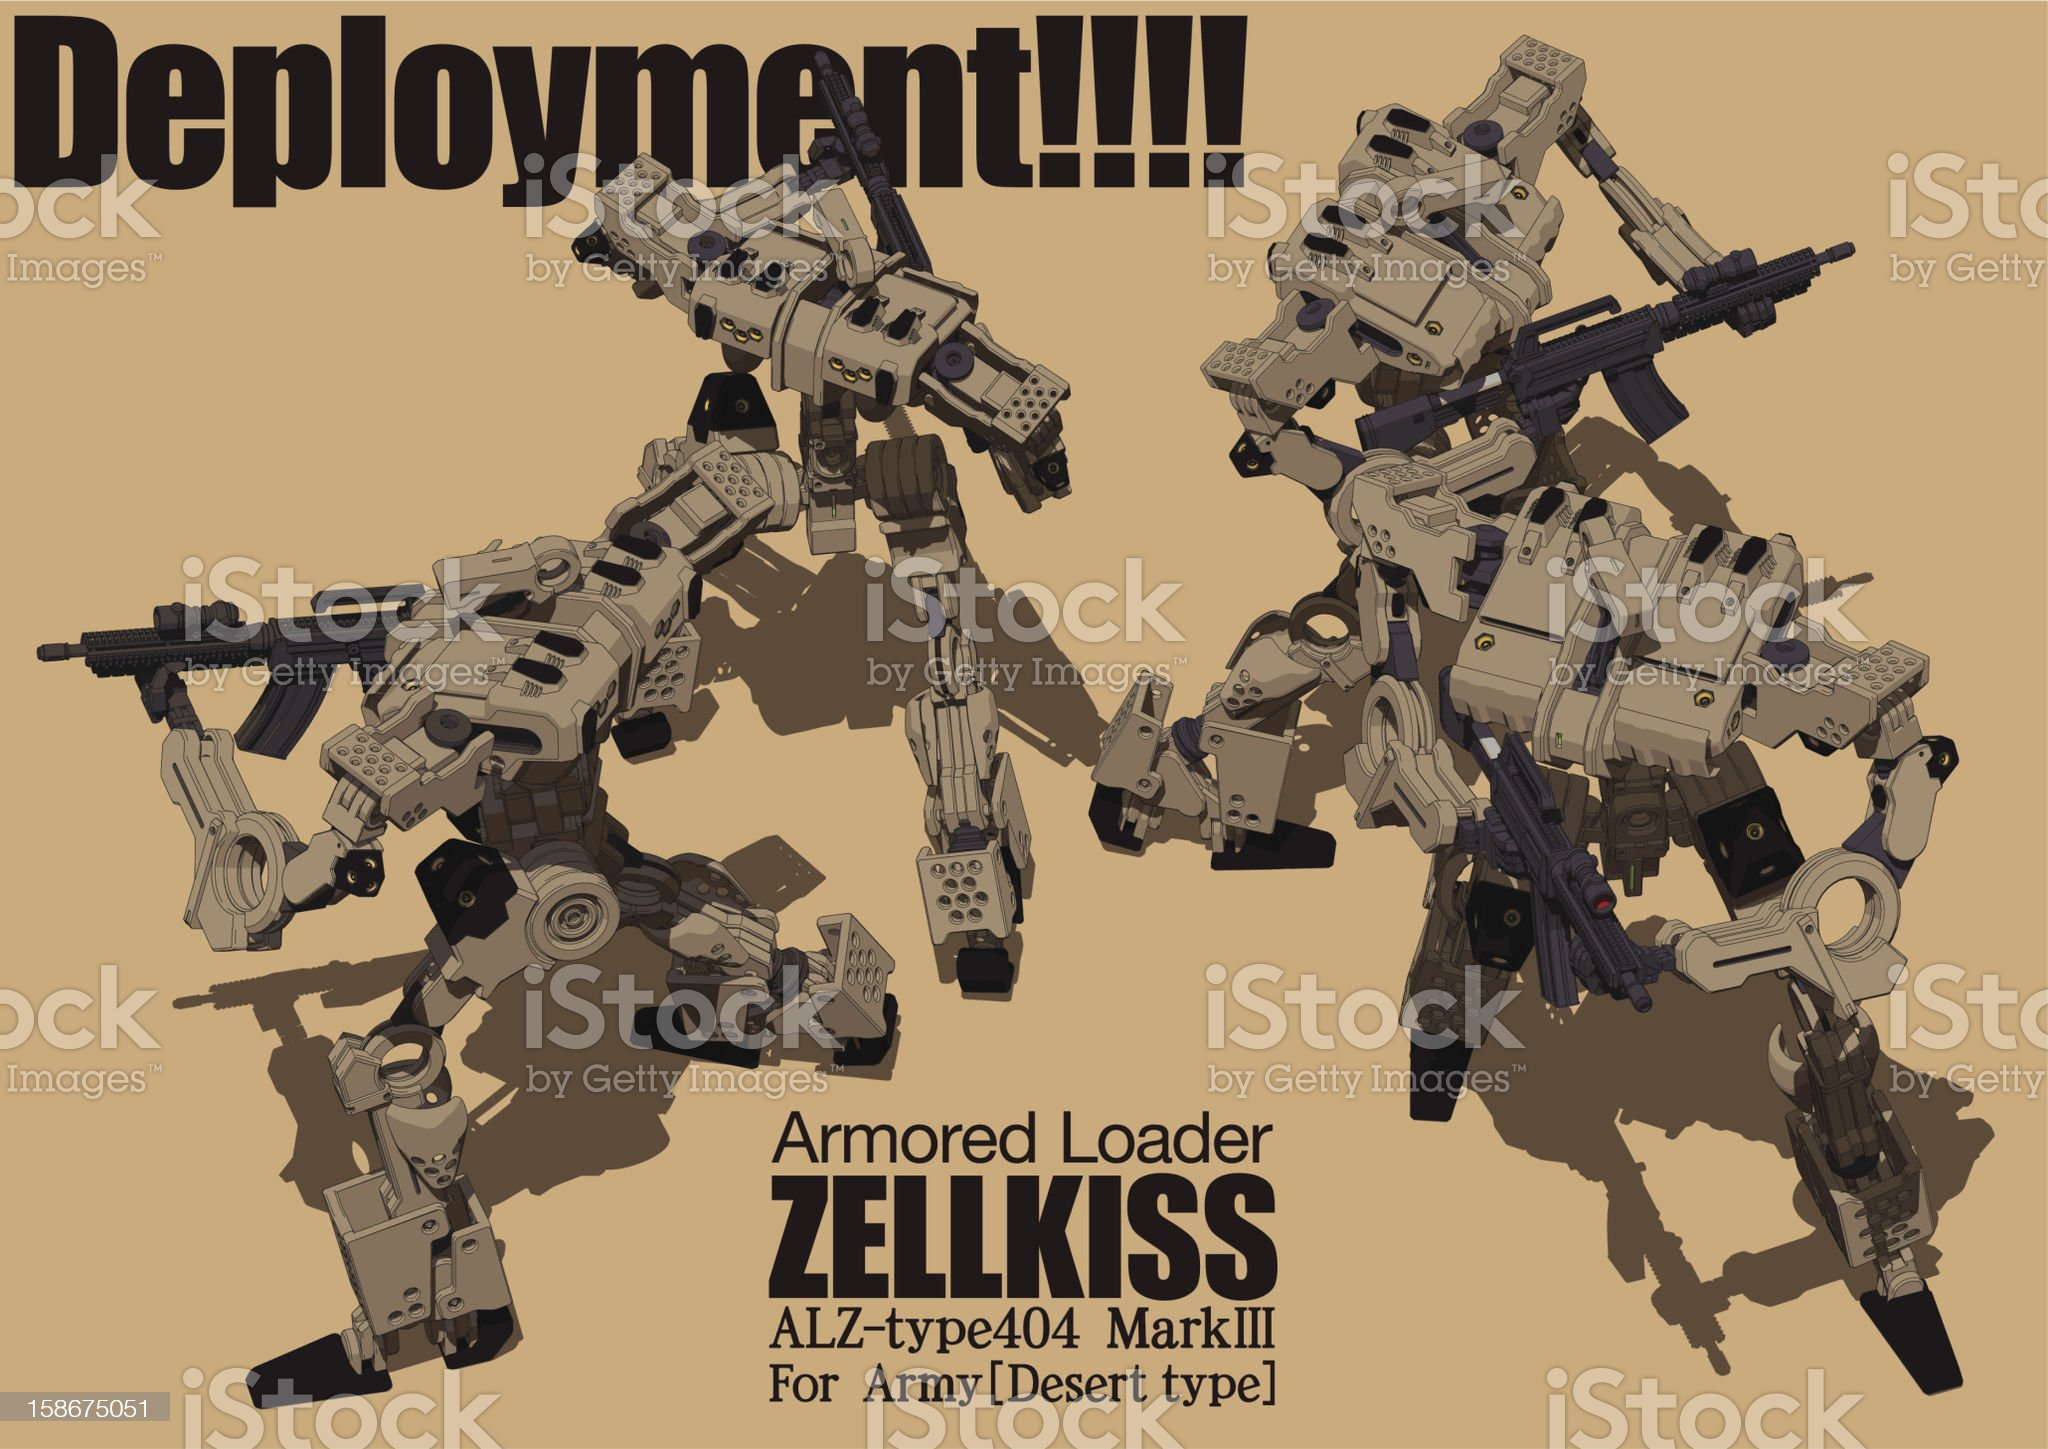 Deployment!!!! royalty-free stock vector art